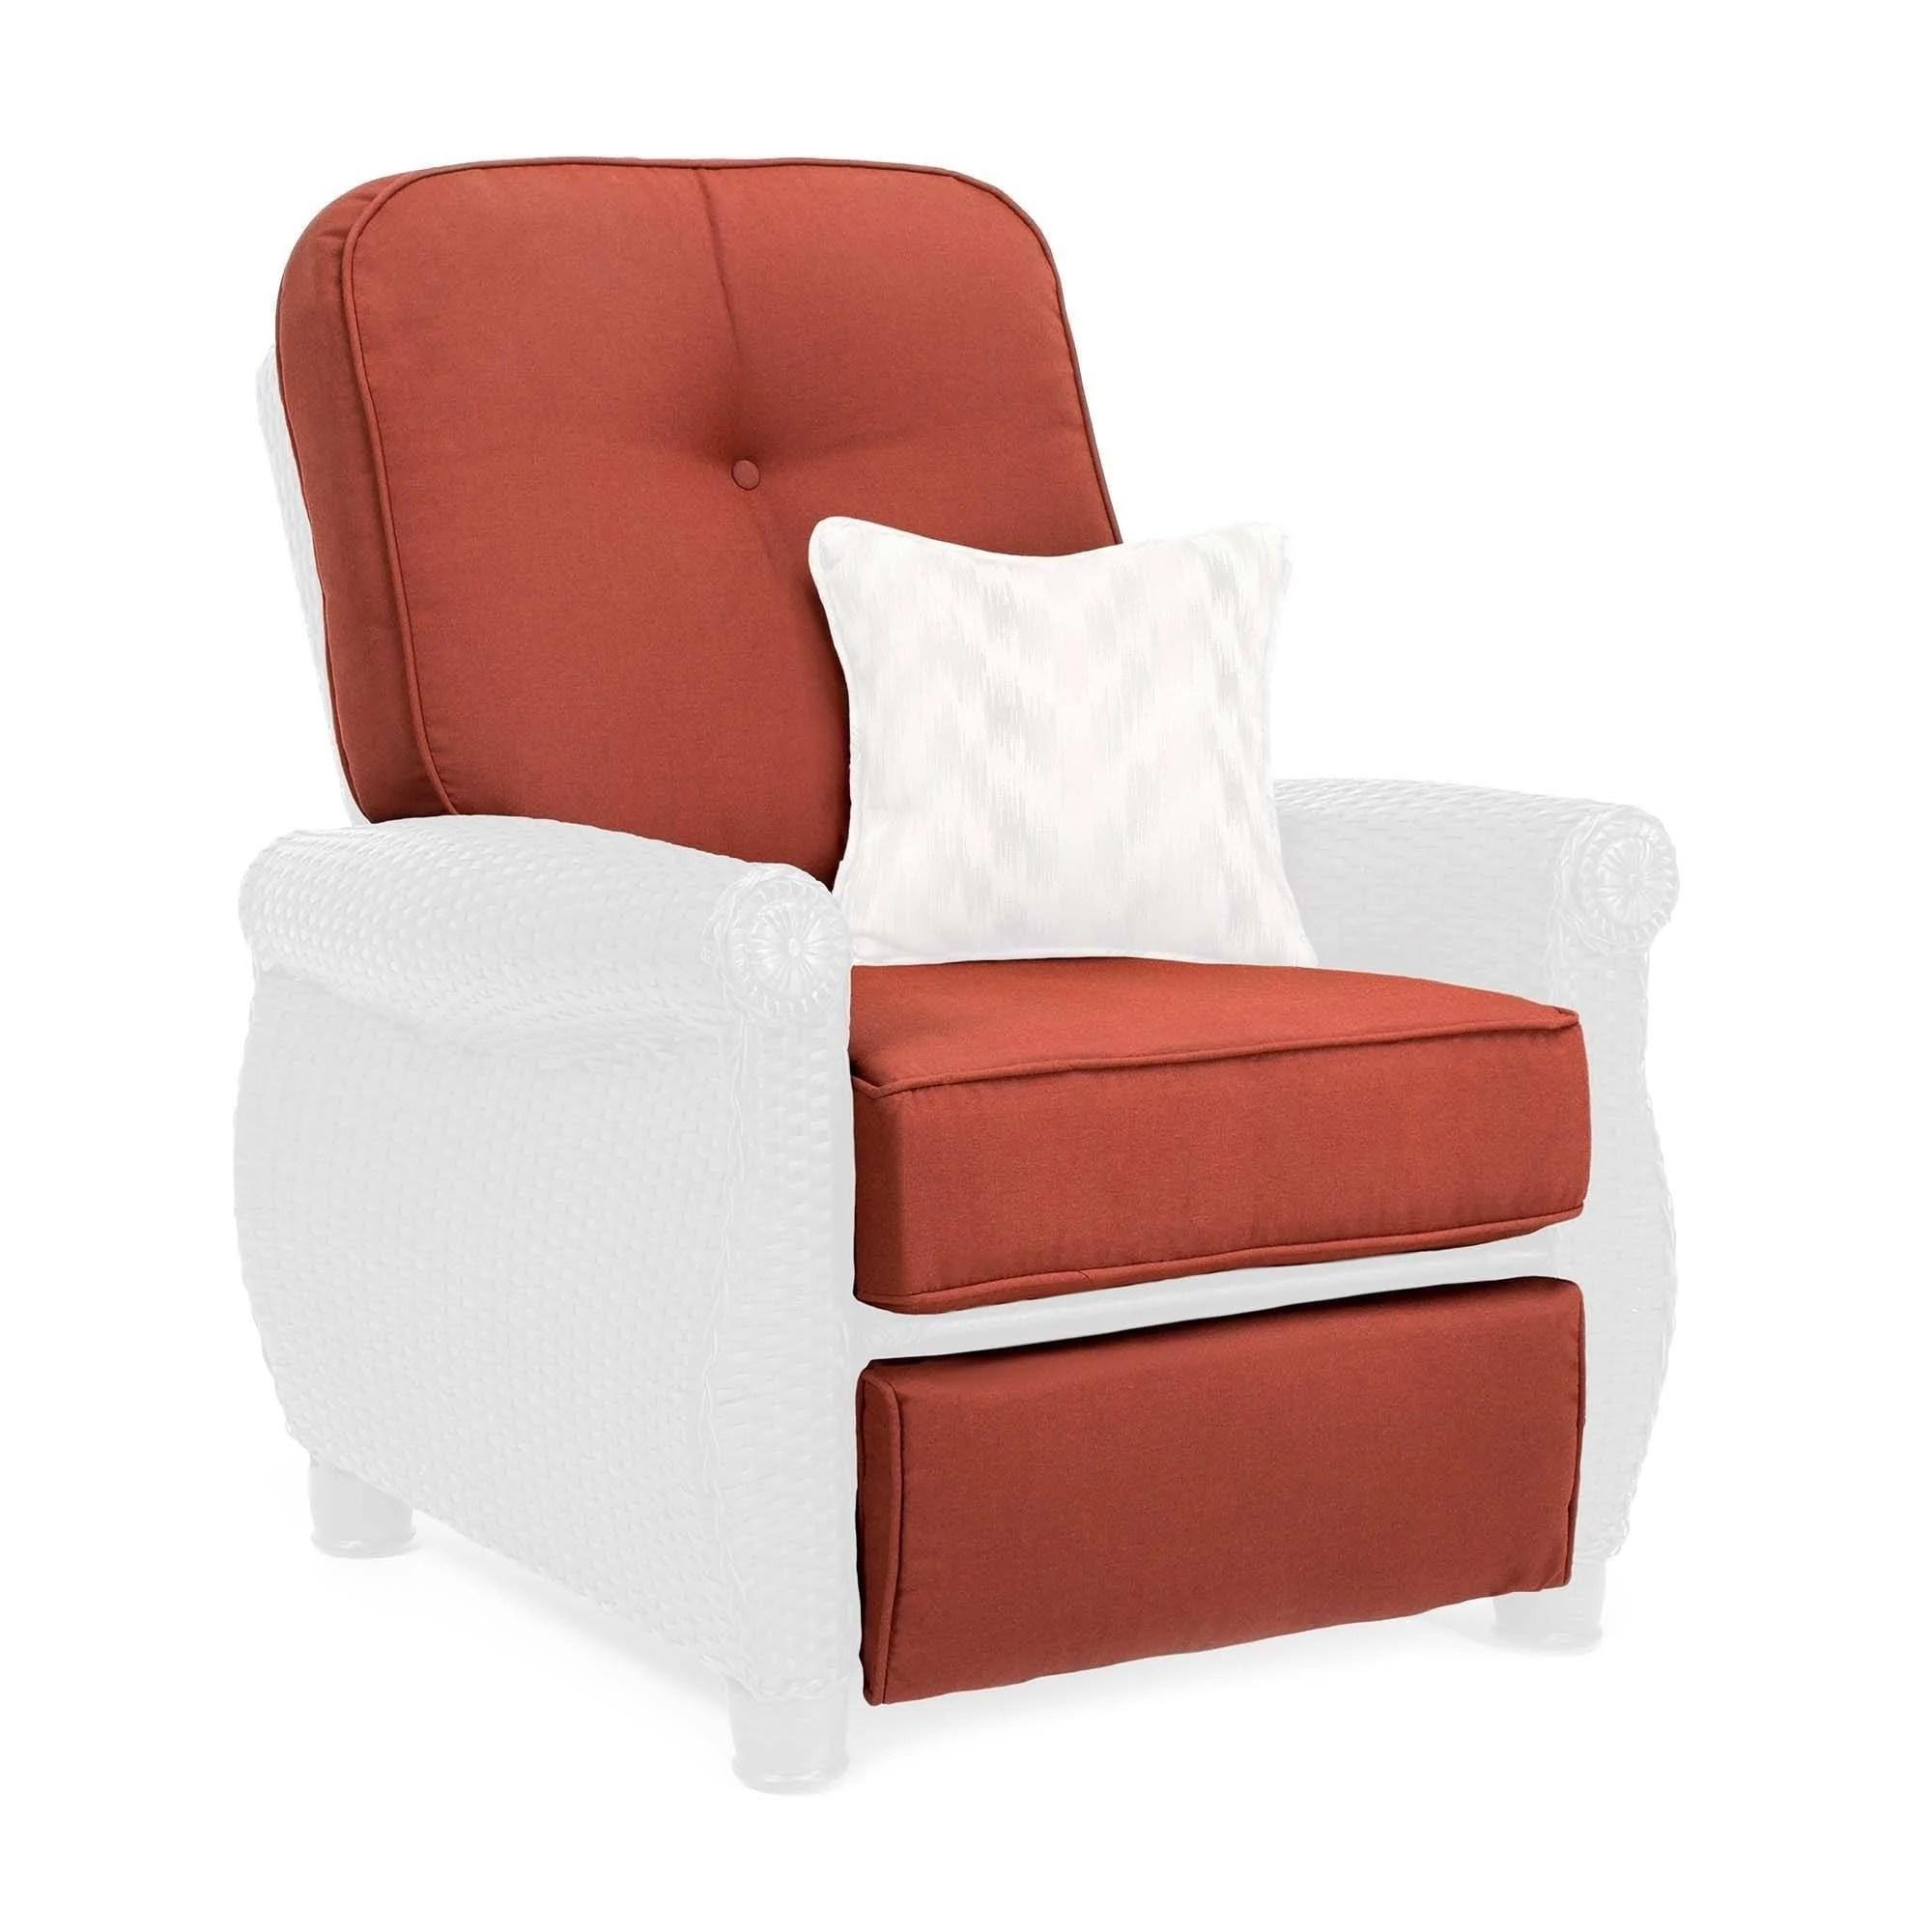 breckenridge outdoor recliner replacement cushion set